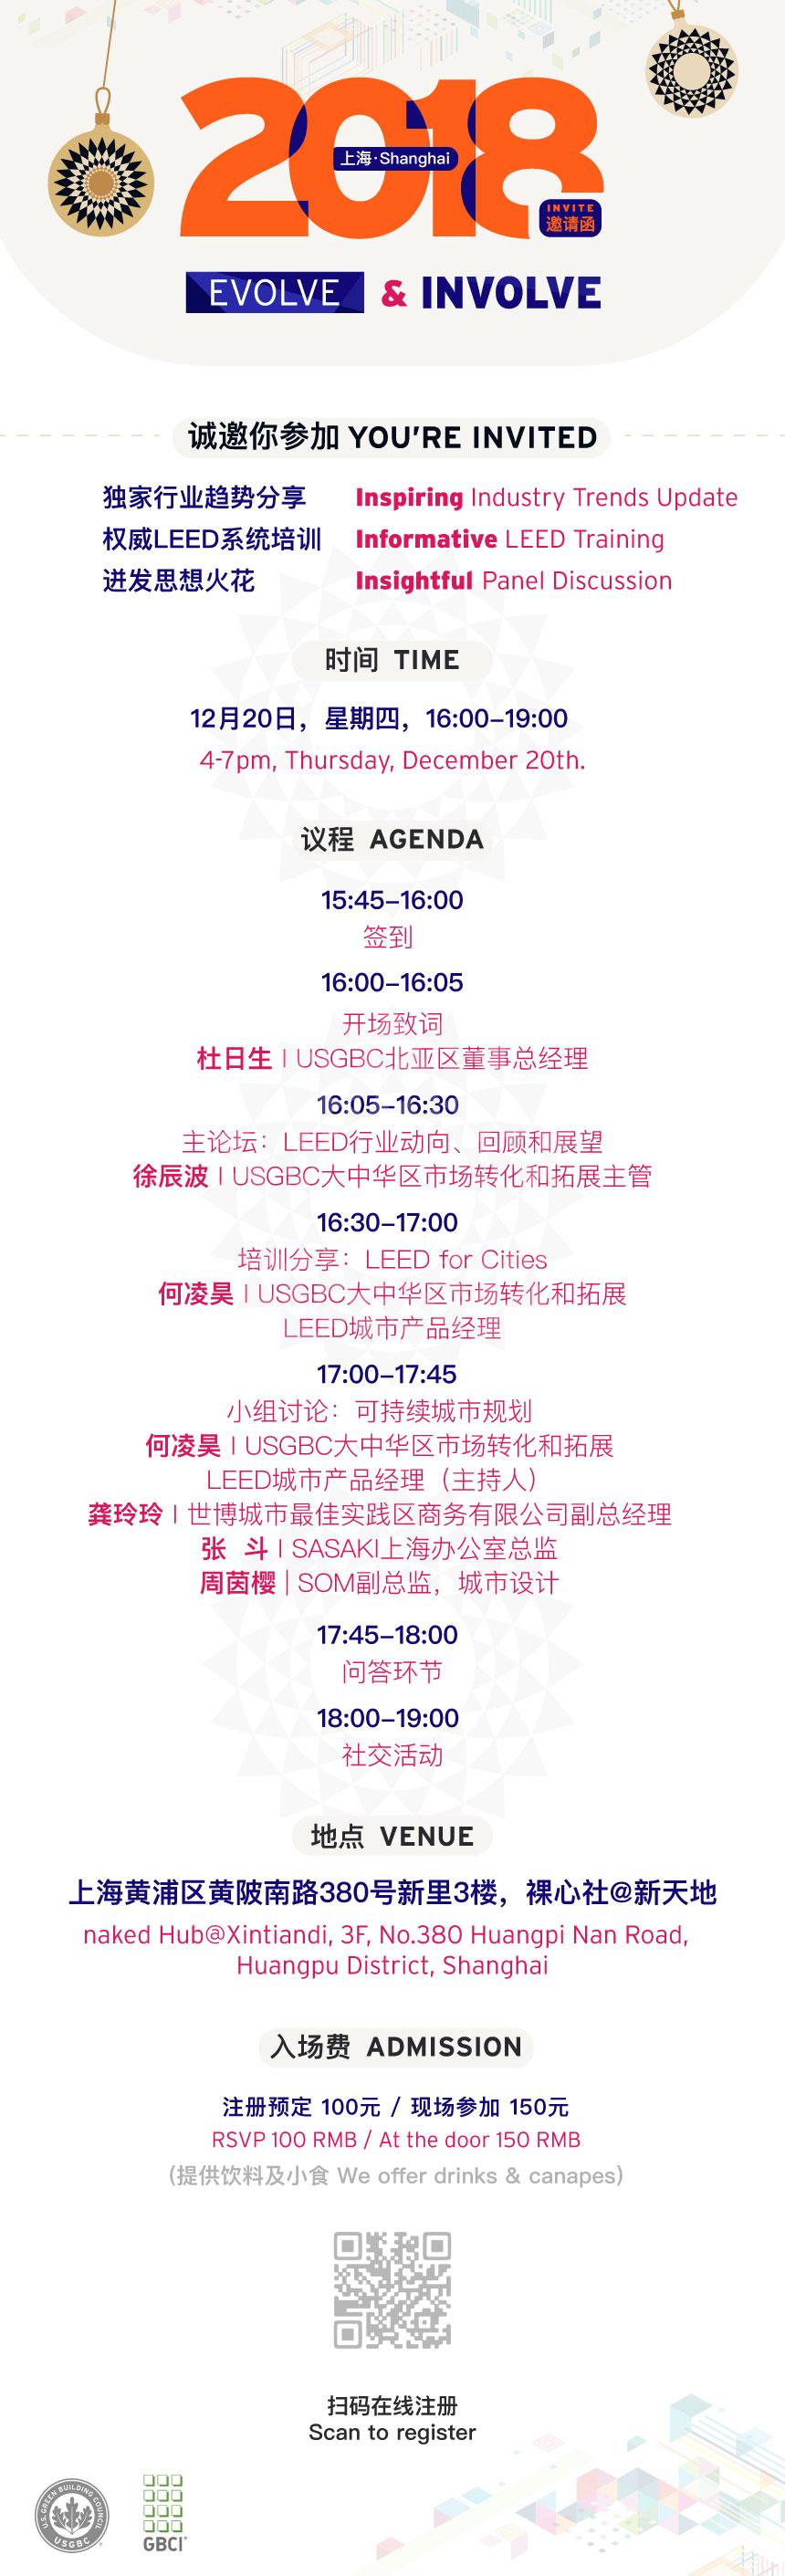 usgbc event.jpeg